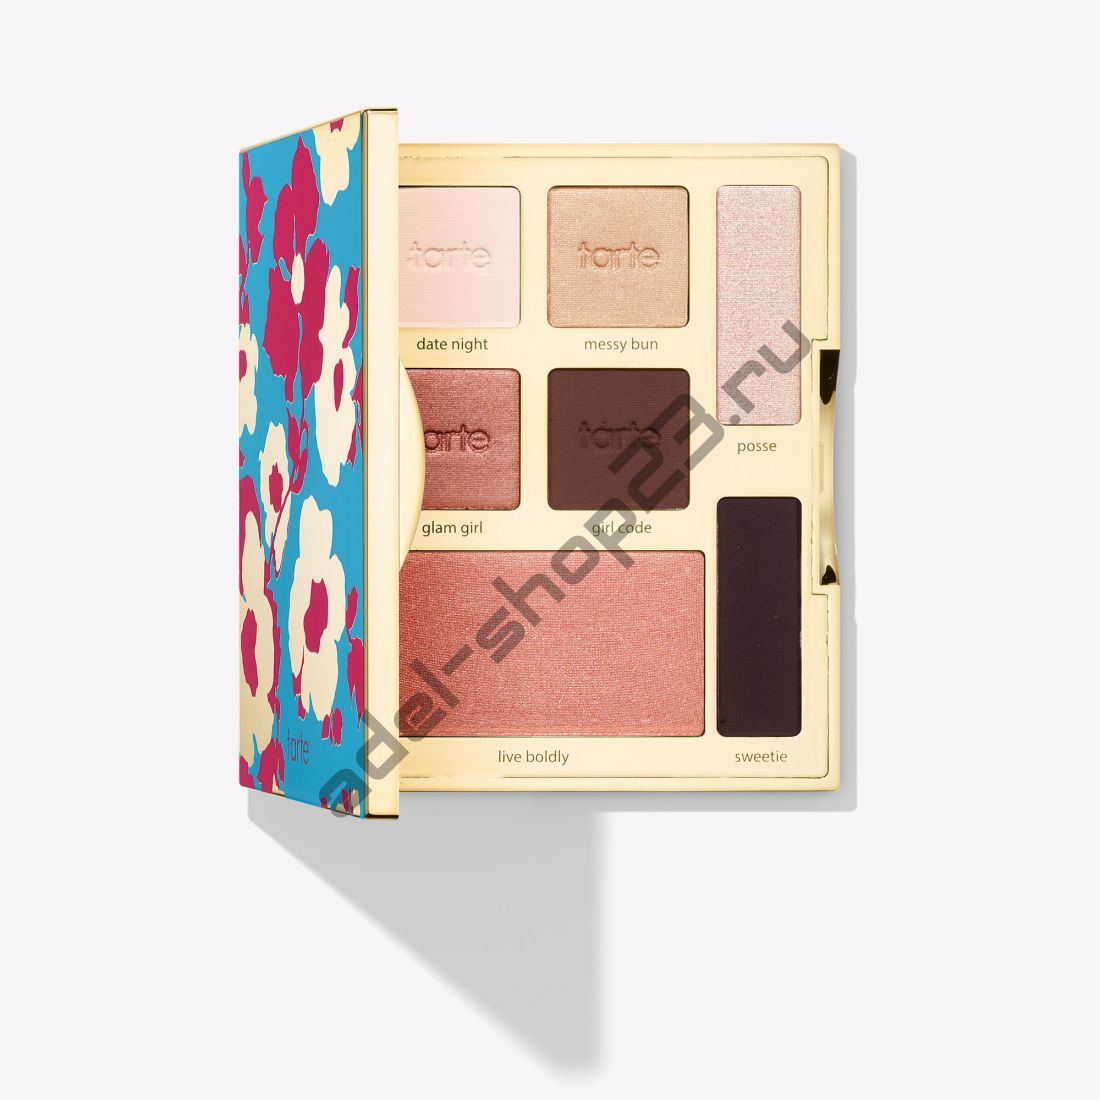 Tarte - limited-edition happy girls shine brighter eye & cheek palette